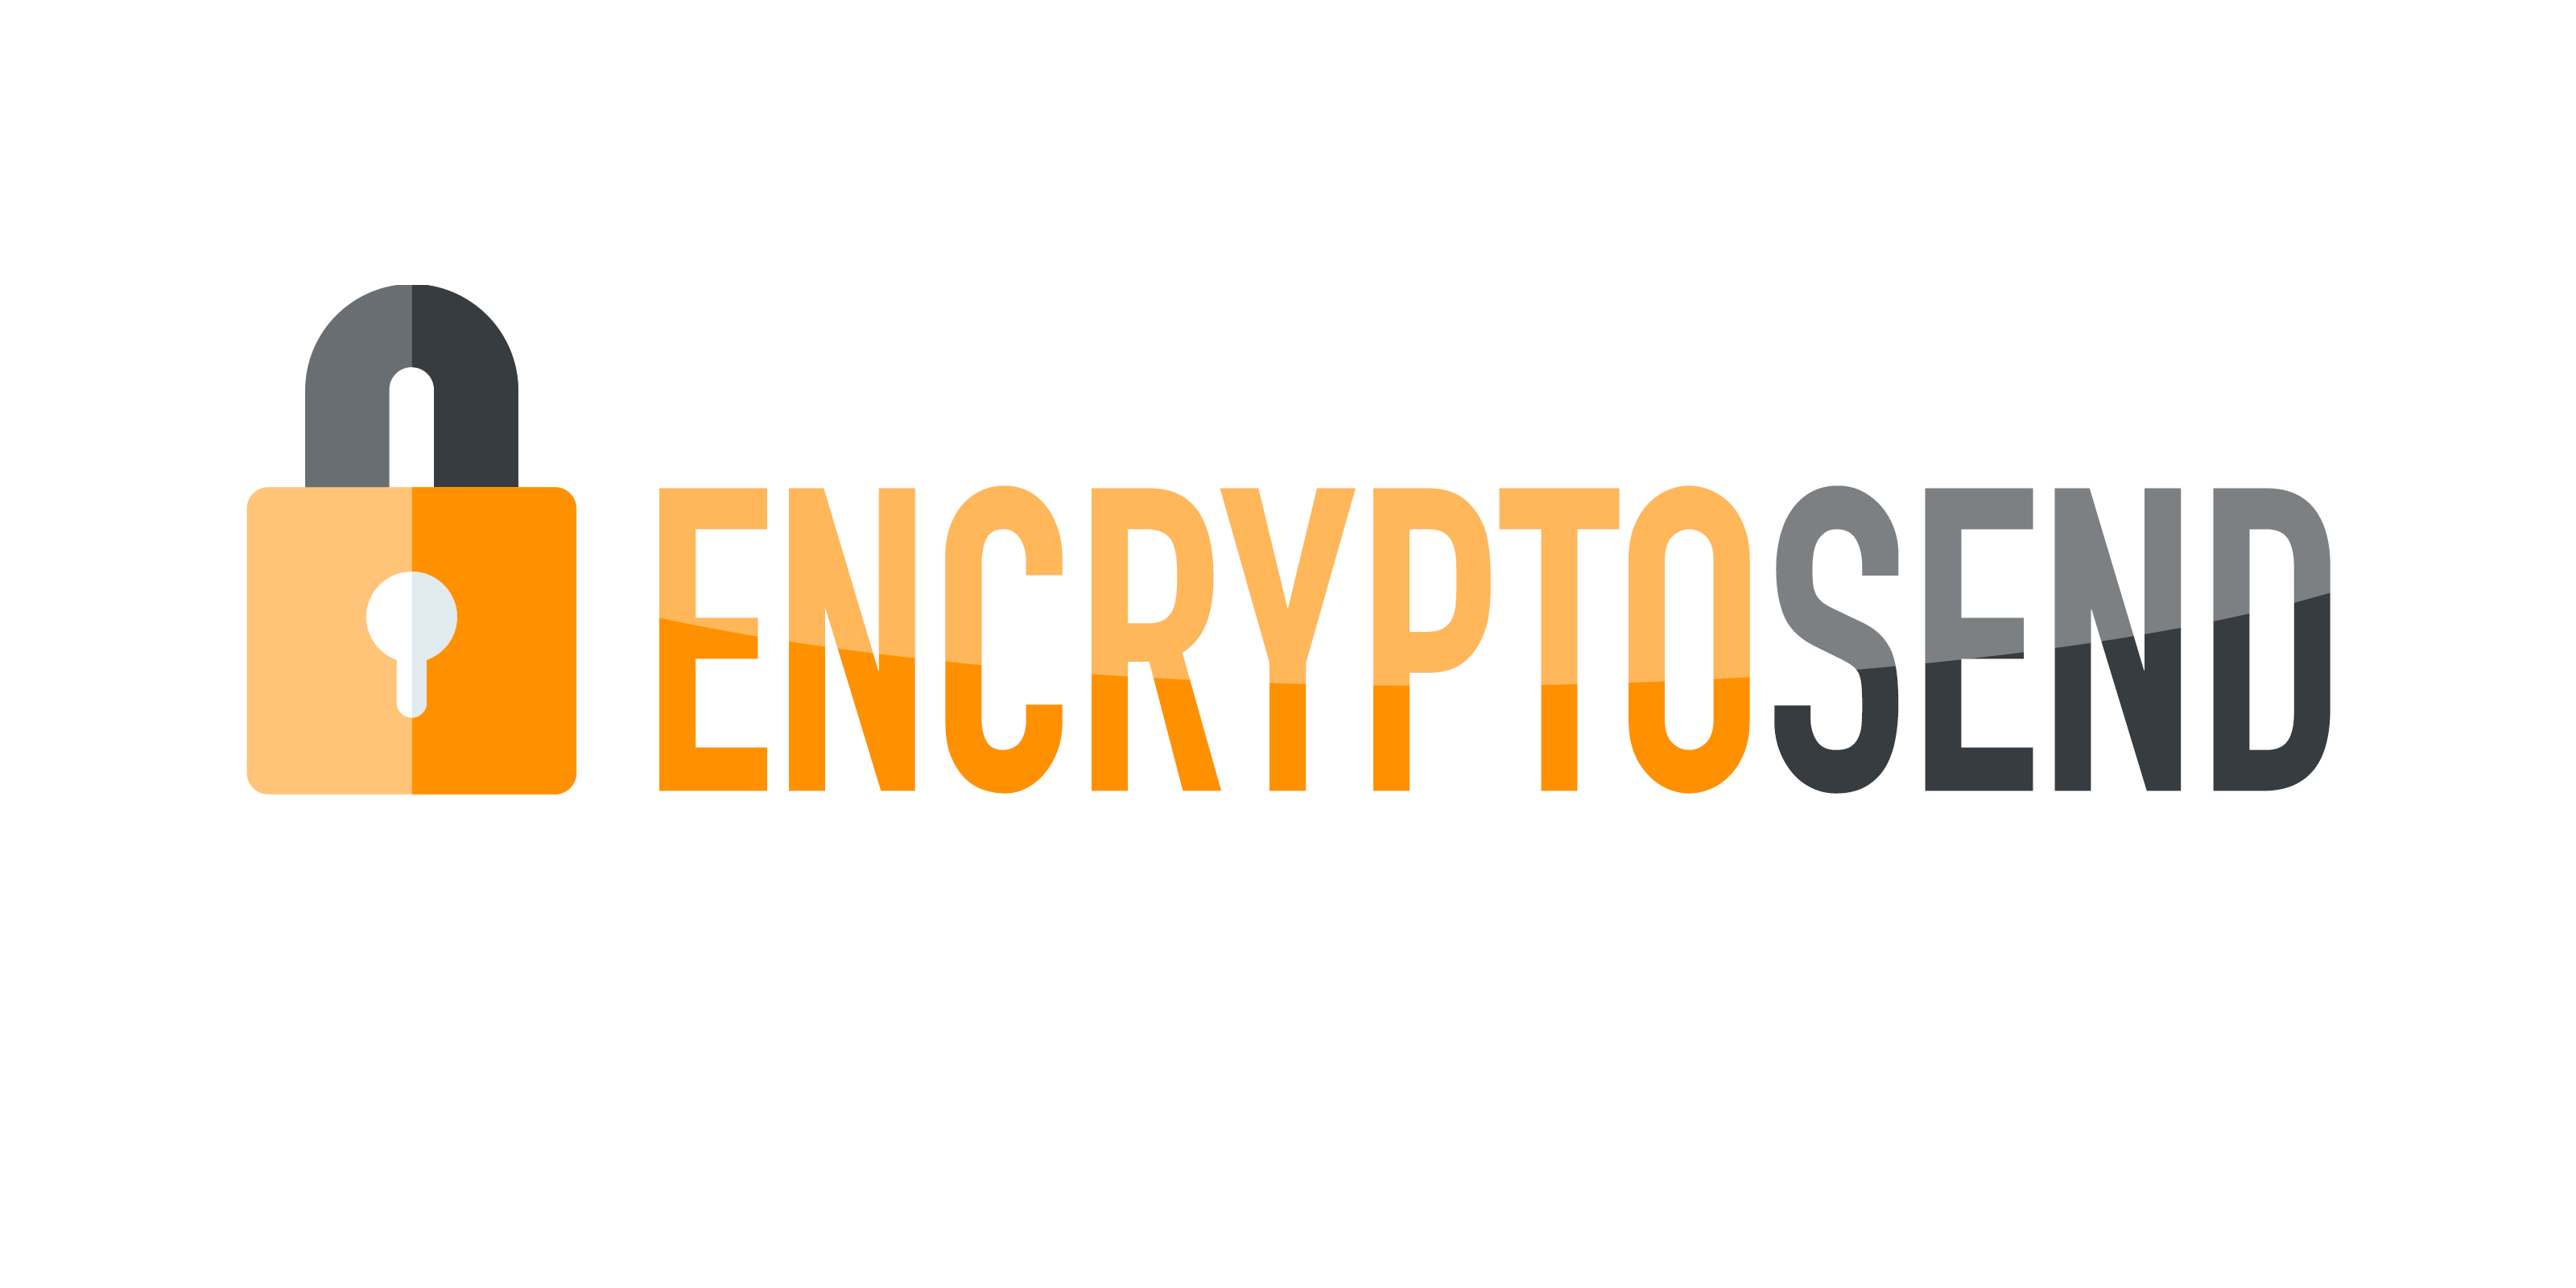 Encryptosend